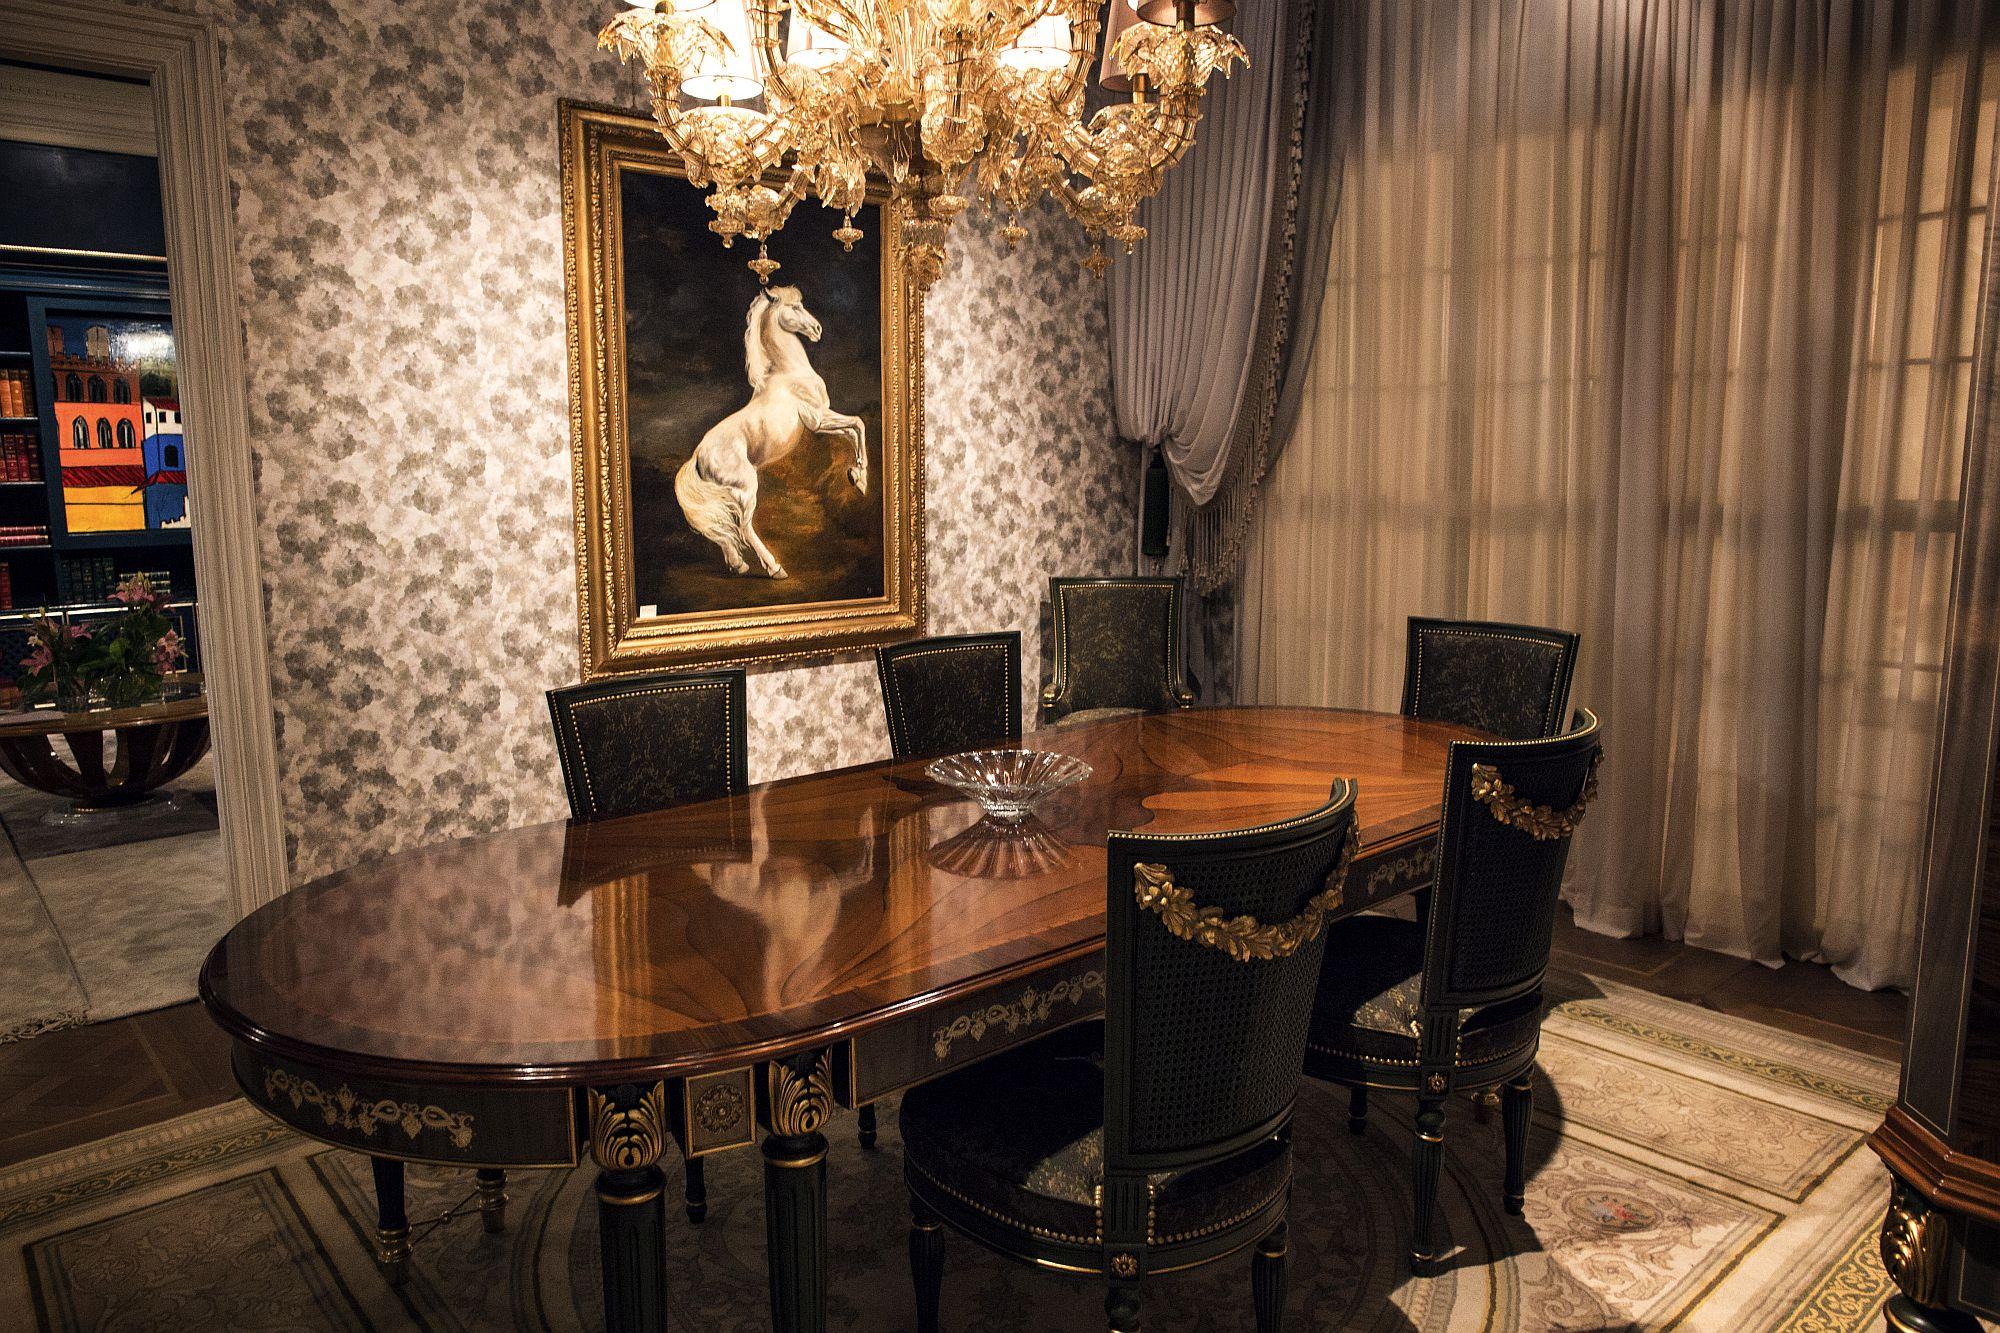 Luxury classic dining room from Italian decor make Medea